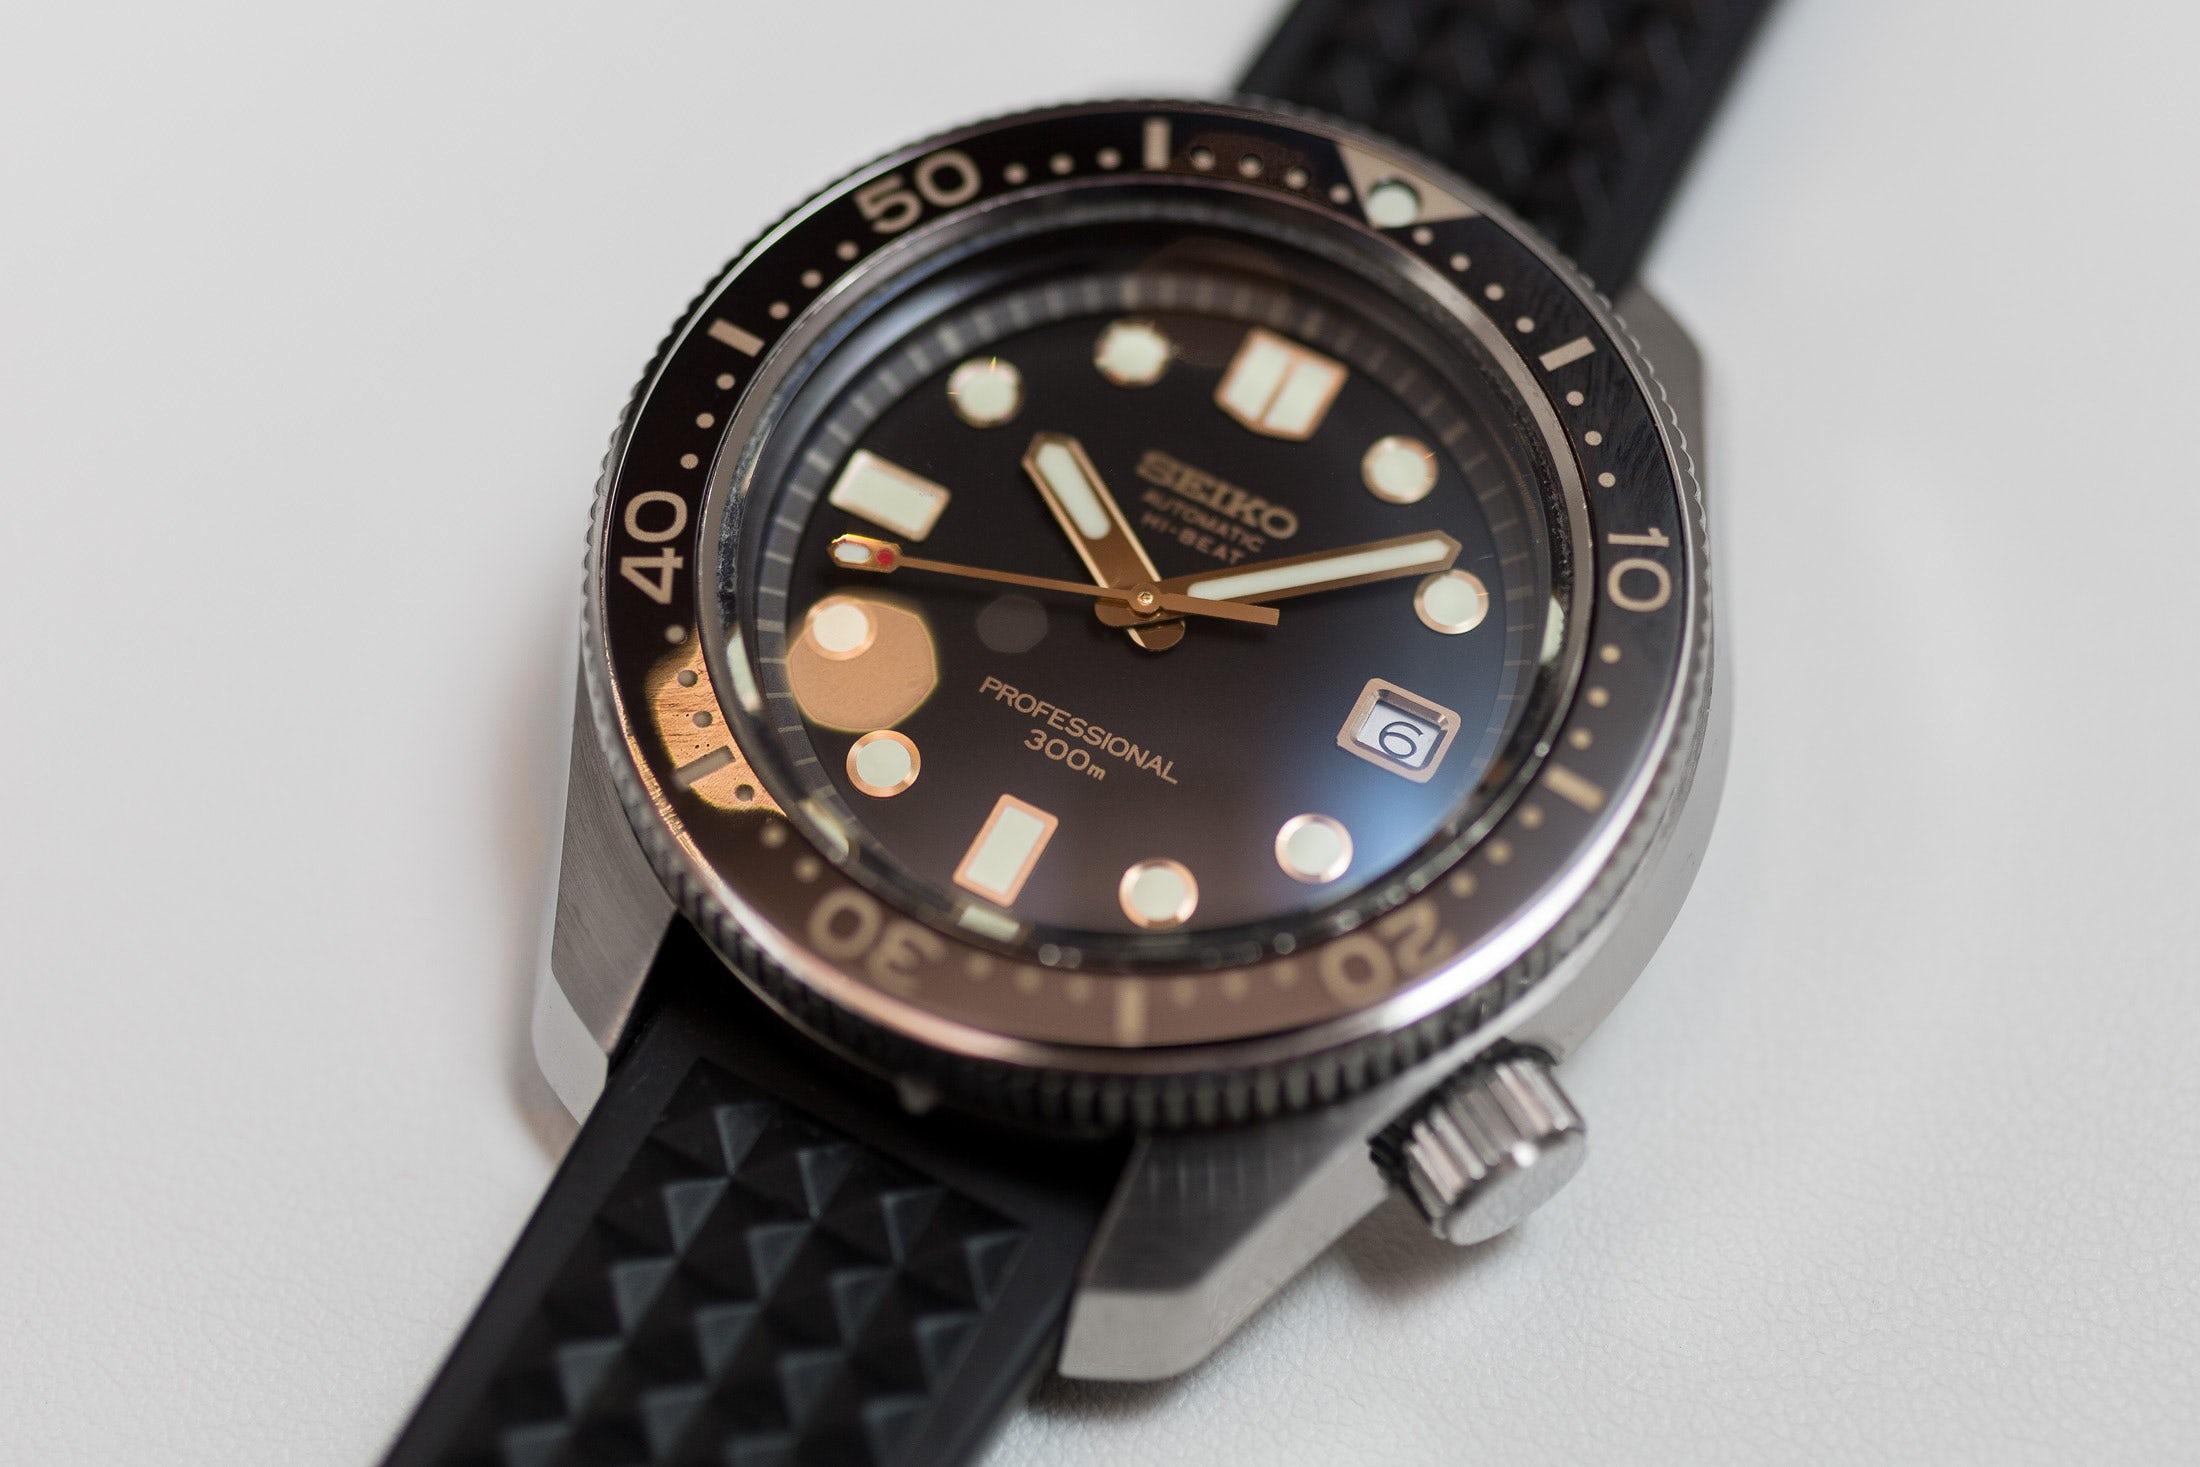 Seiko_SLA025_Diver-6.jpg